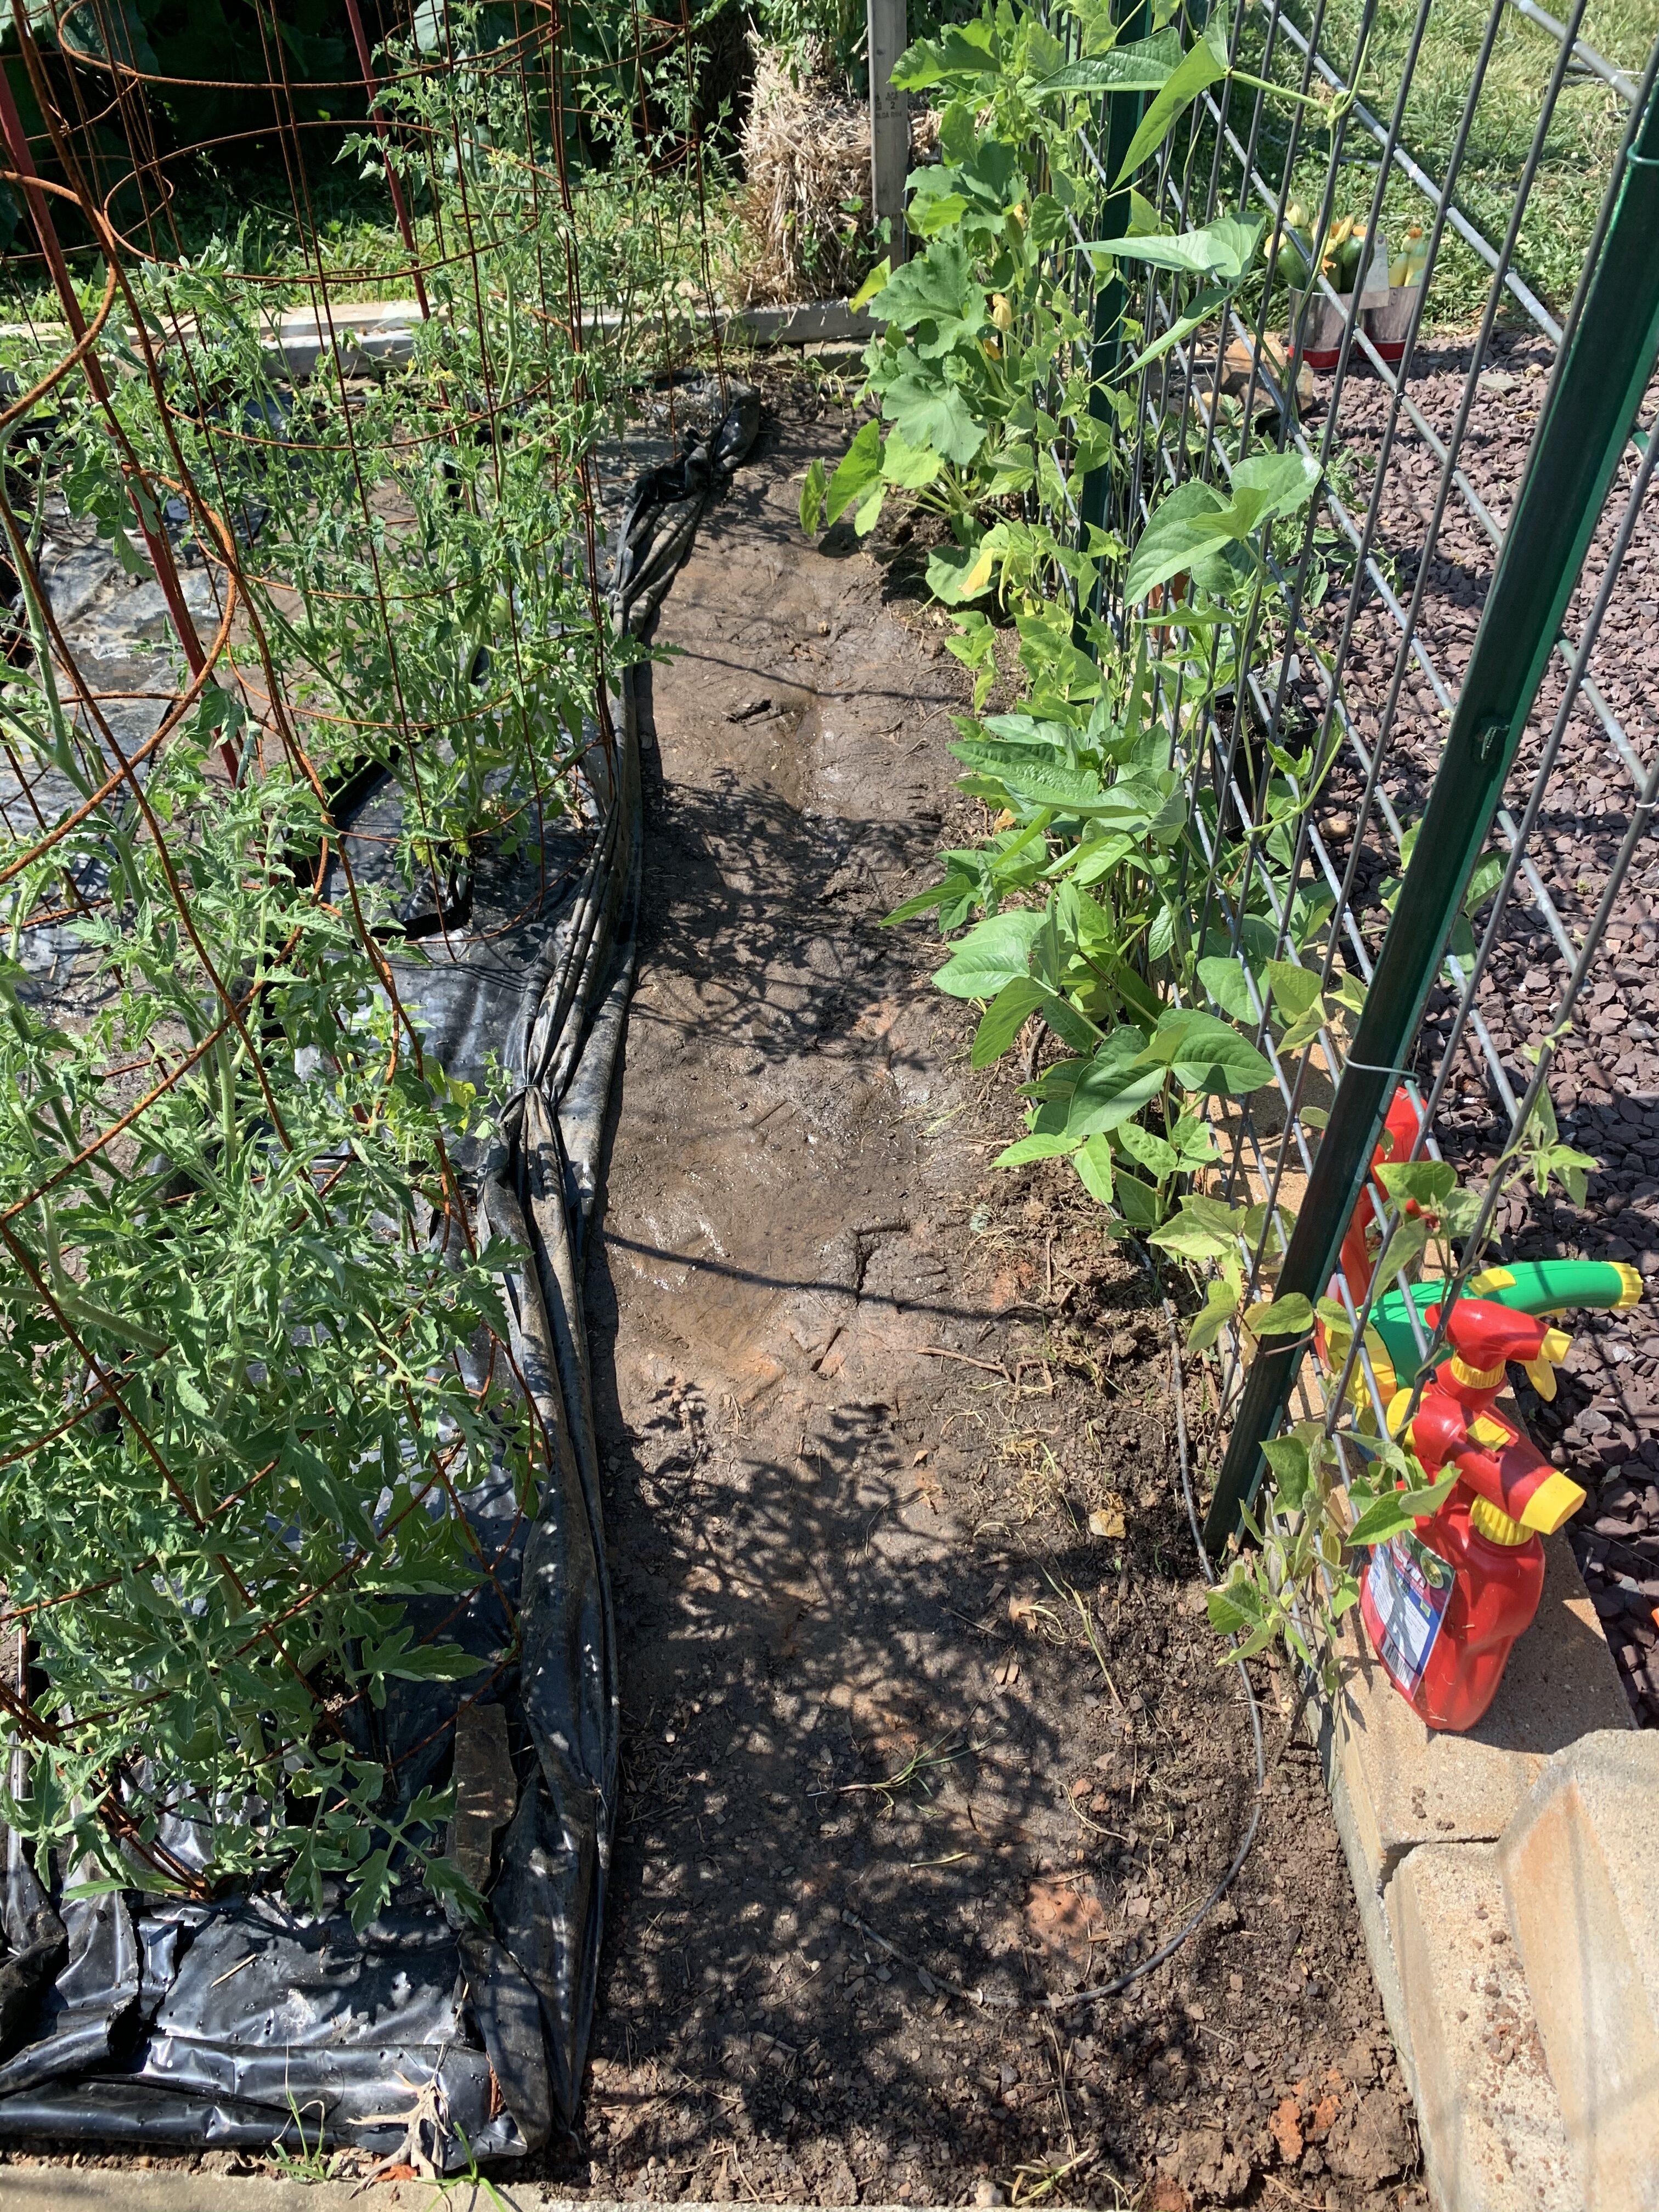 F0DB7224 E889 46D1 A537 644F0C3DEF5F Fourth of July Tomato!